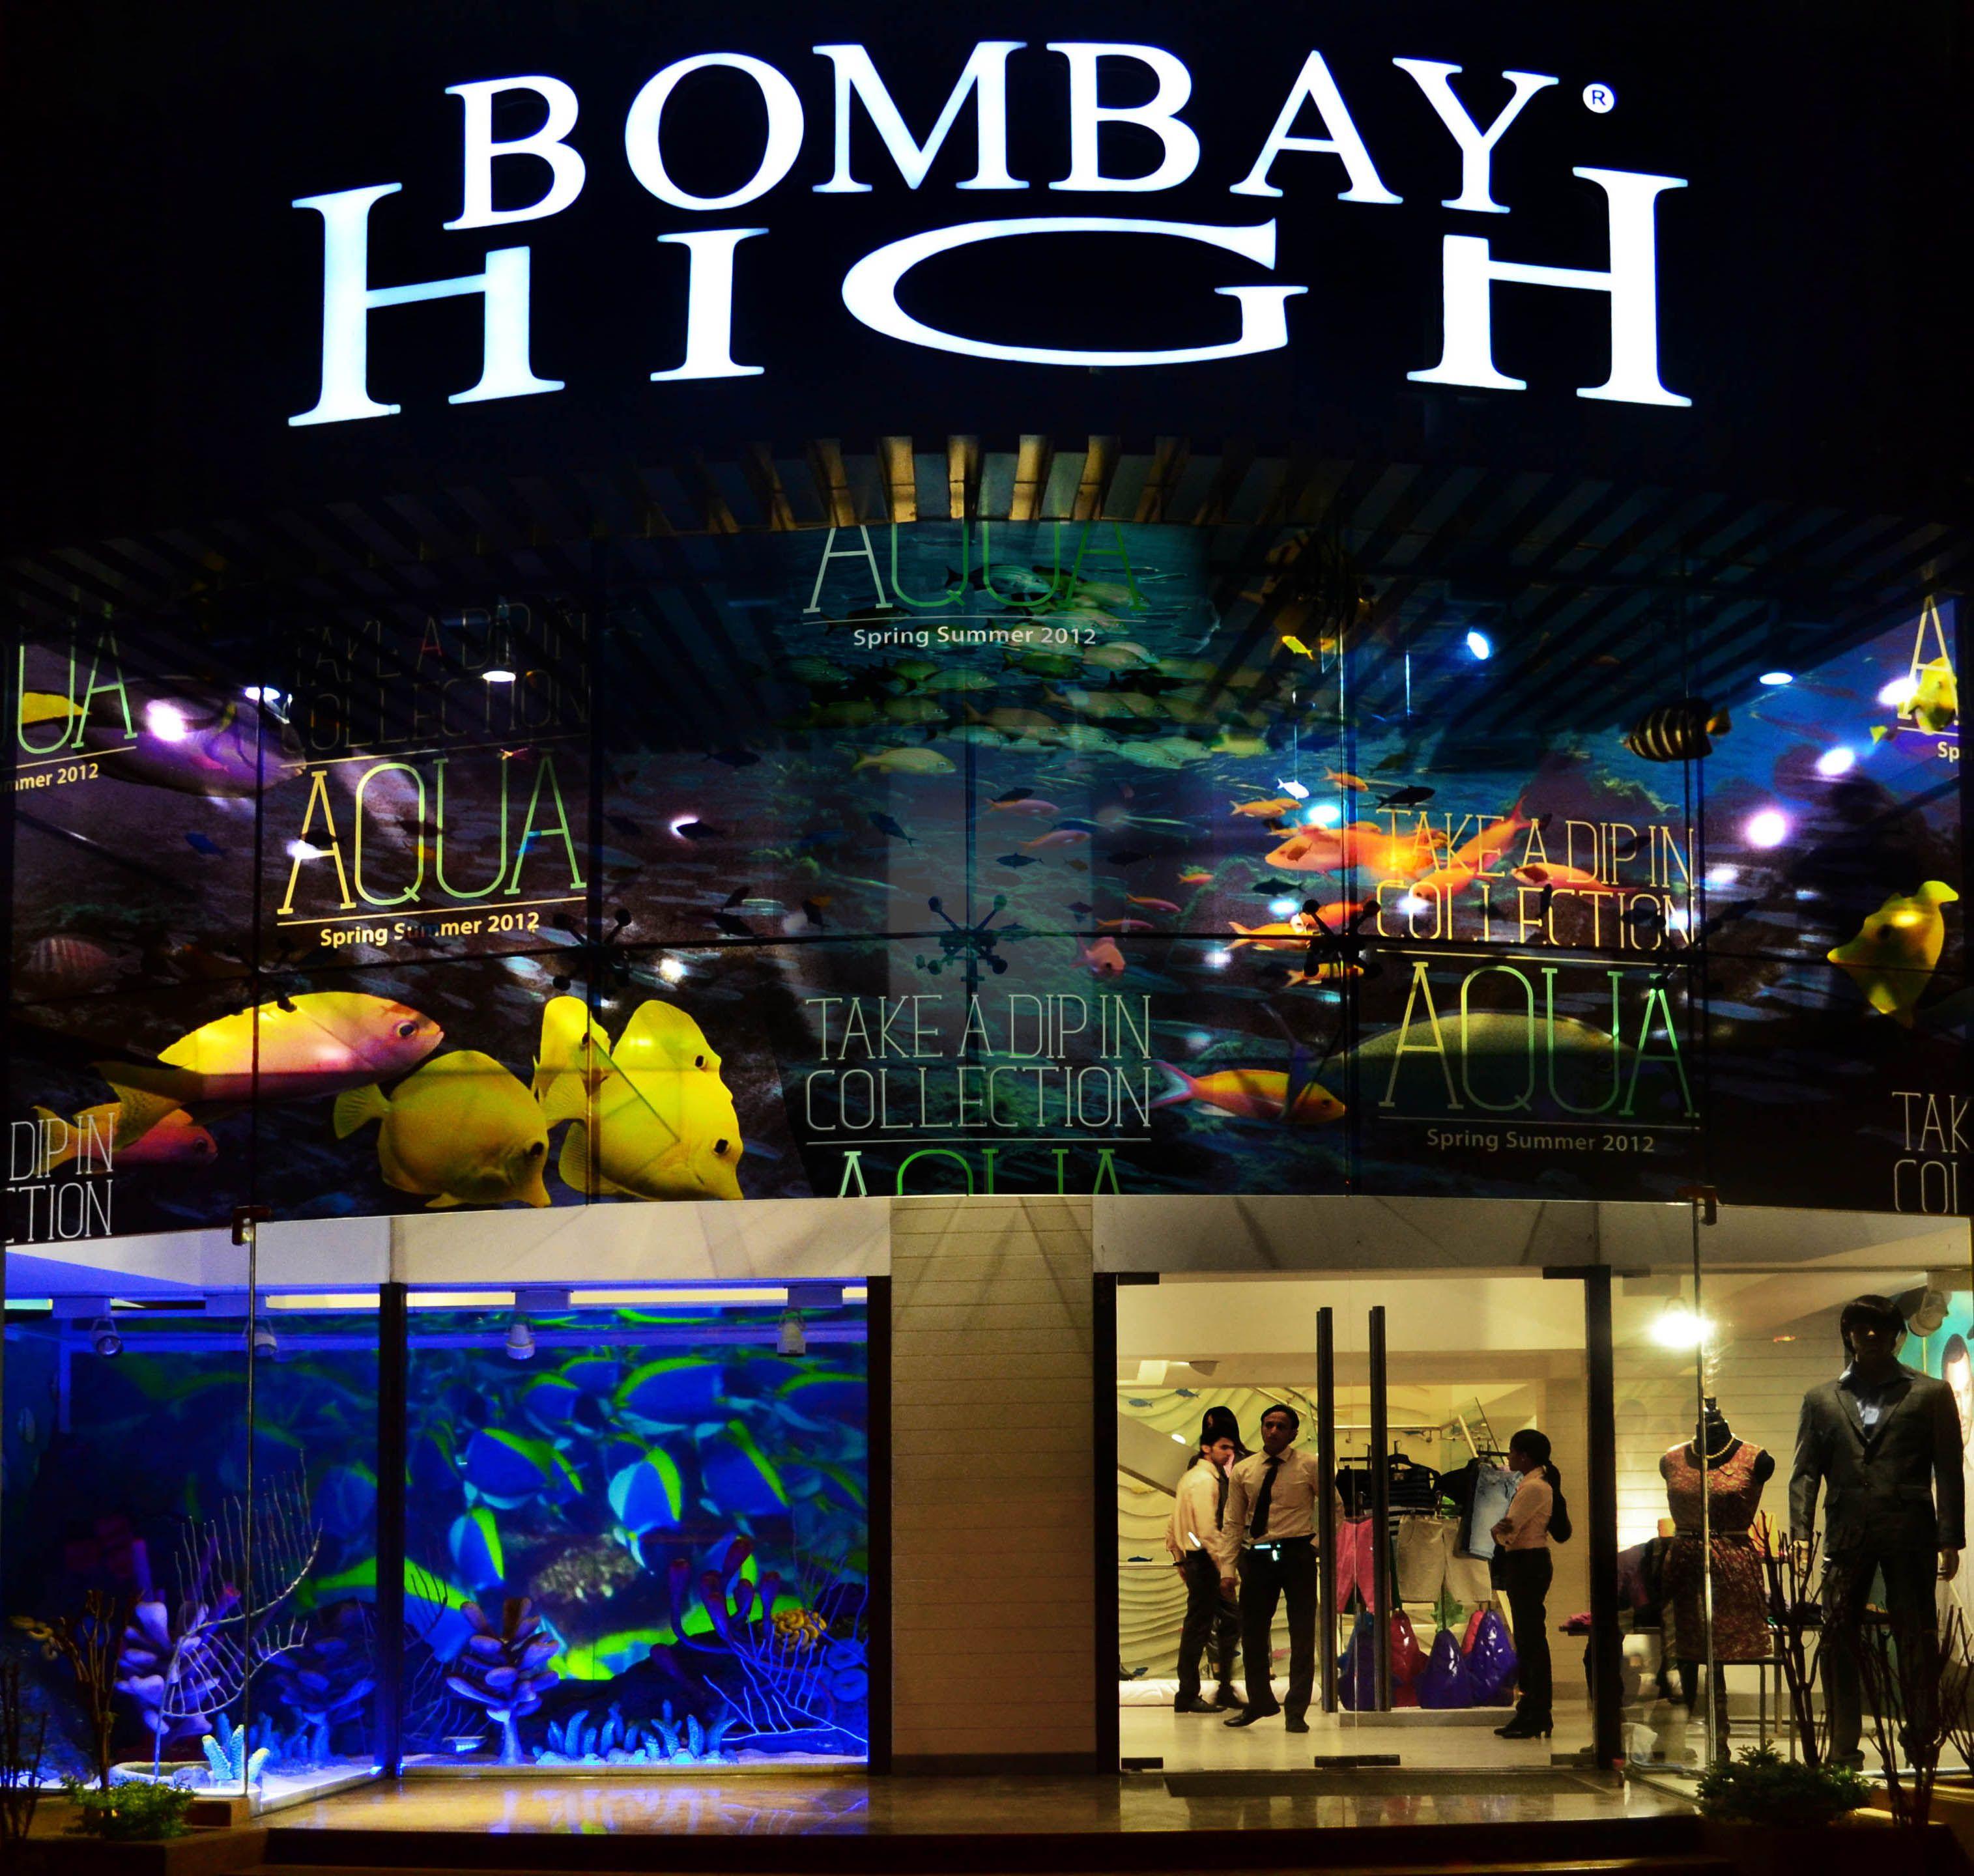 High on Bombay High windows, Store windows, Mumbai